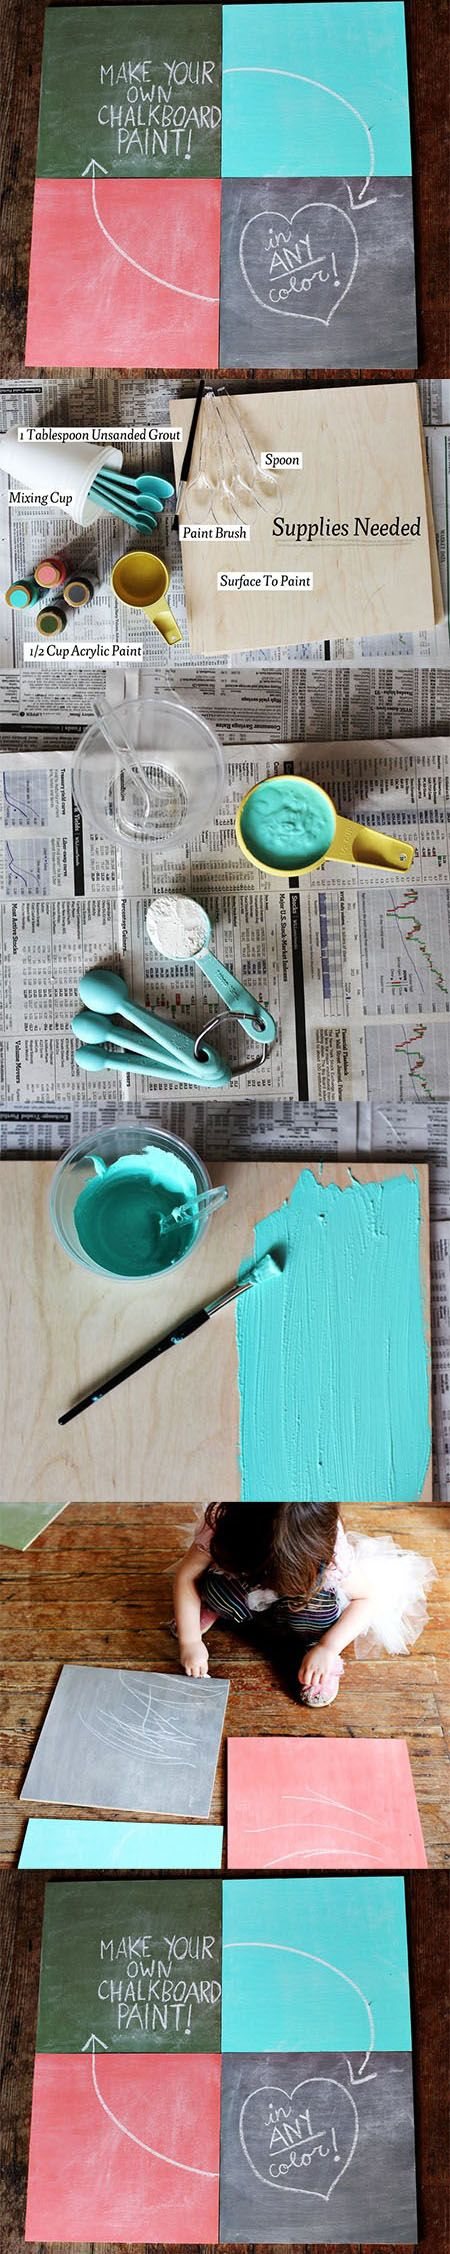 Diy Chalkboard | DIY & Crafts Tutorials